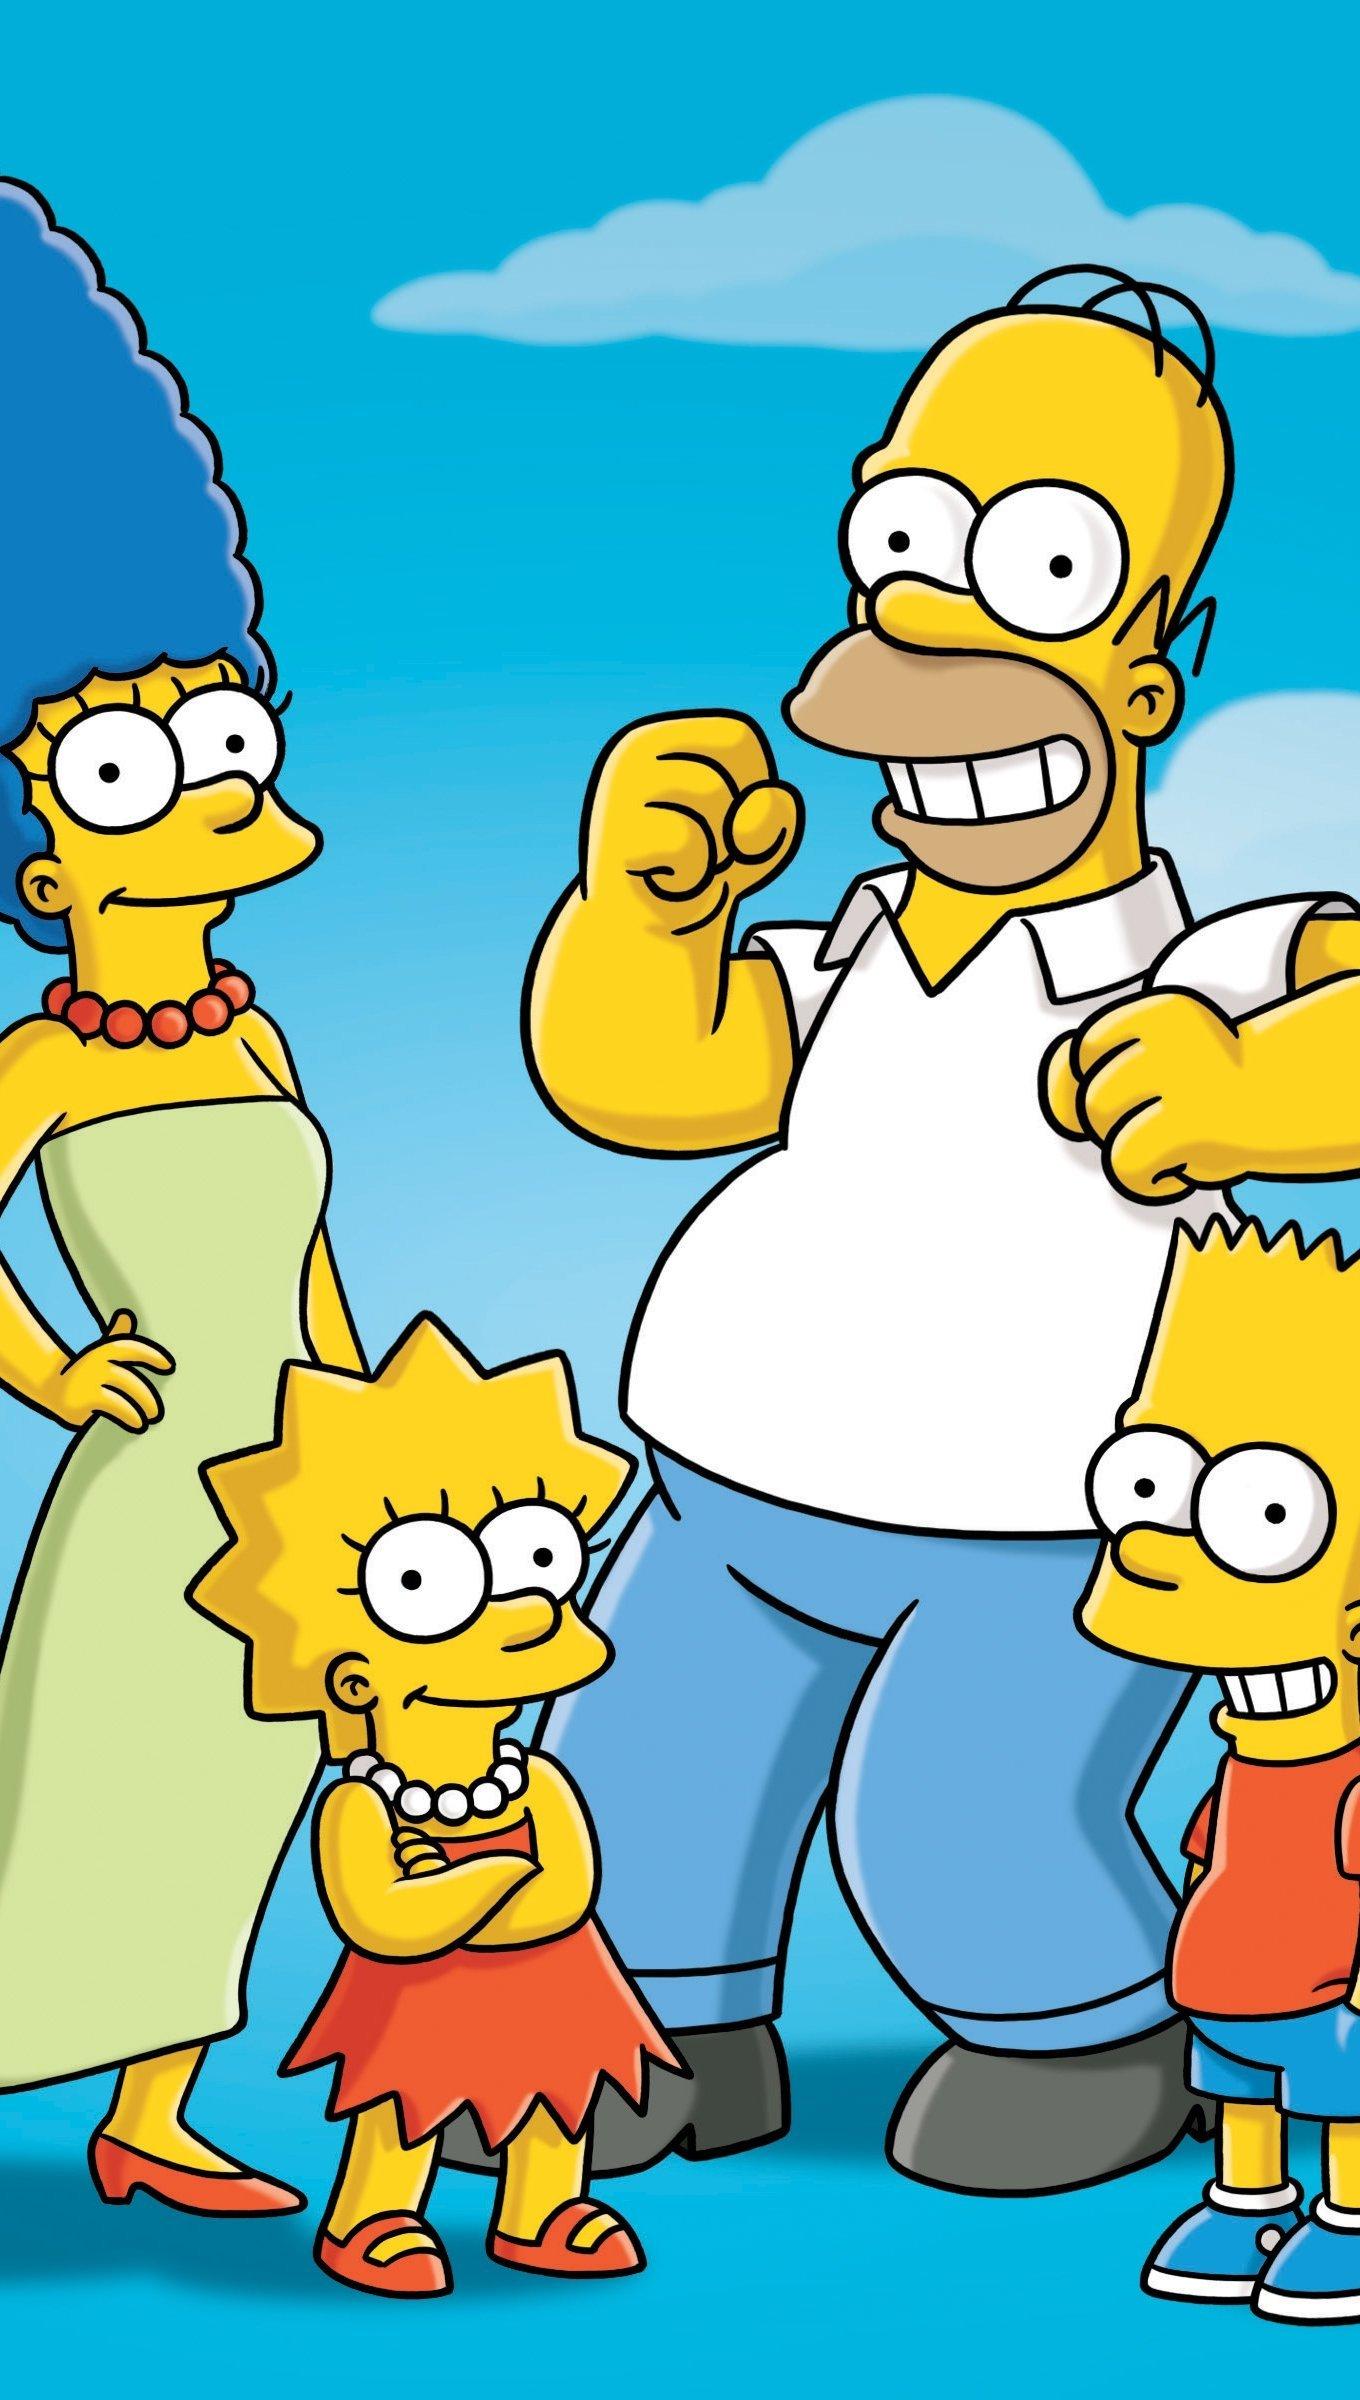 Wallpaper The Simpsons Vertical